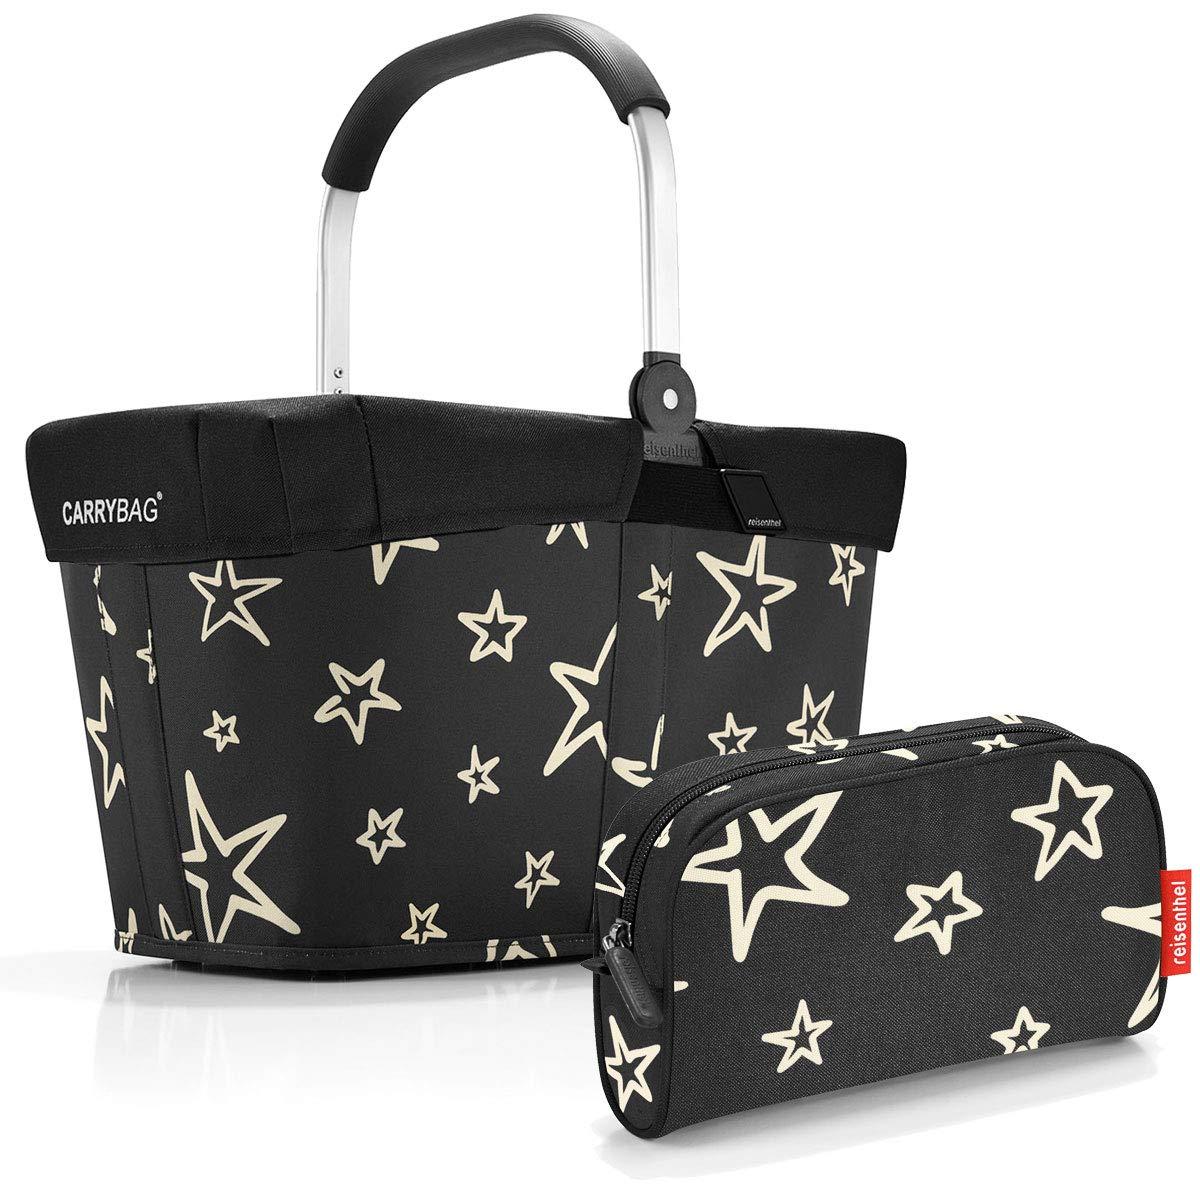 dots-dots reisenthel carrybag mit Abdeckung Cover Deckel Plus GRATIS makeupcase